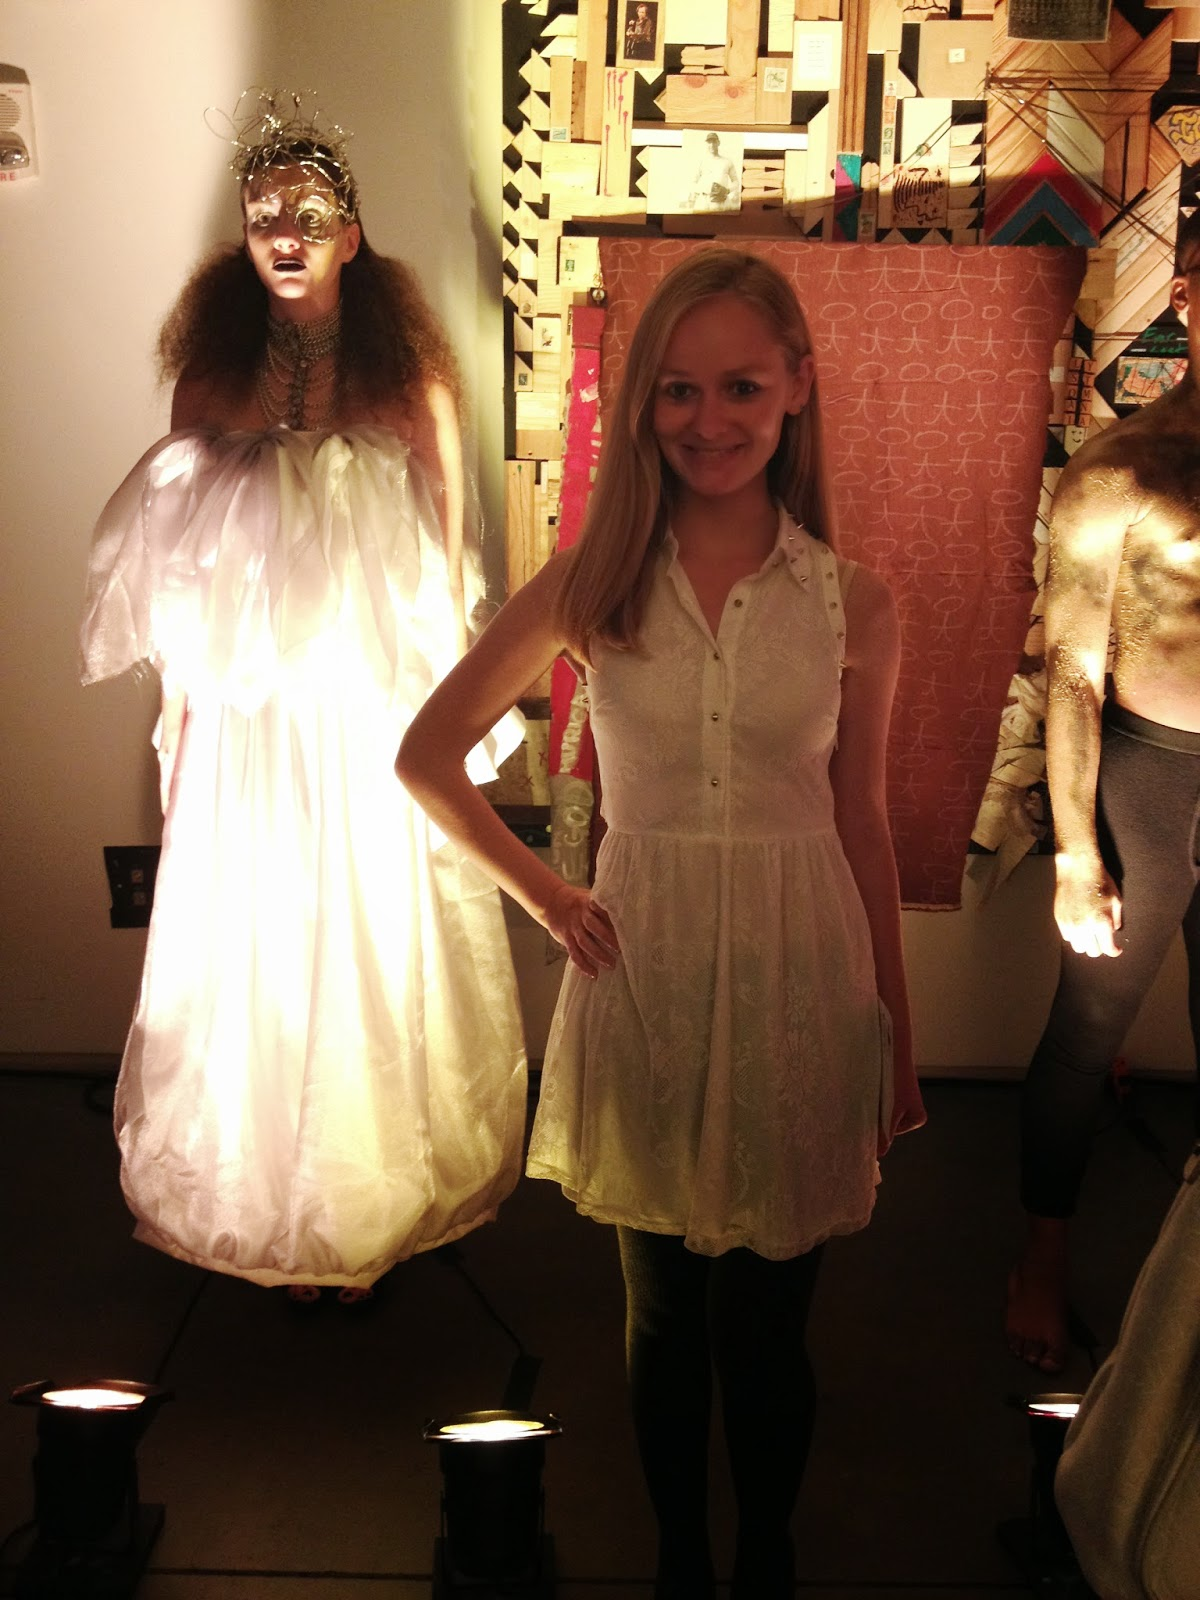 Boston Fashion Week at the ICA